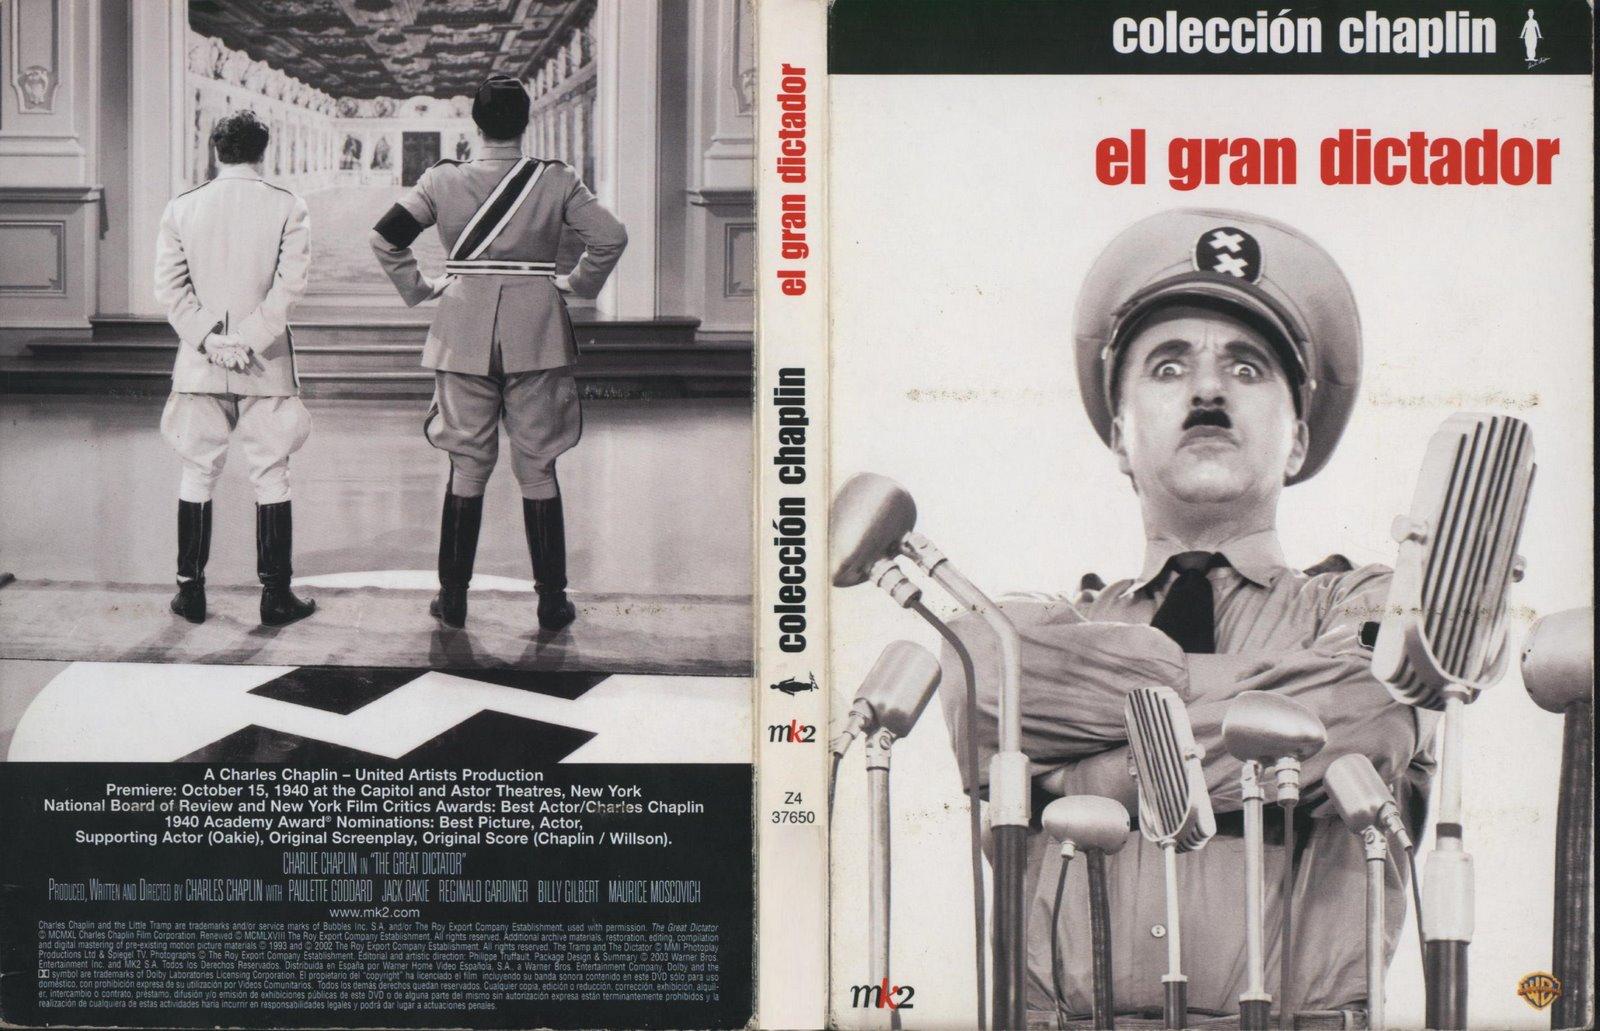 http://1.bp.blogspot.com/_j6QQQOewacQ/TKegs8j066I/AAAAAAAACzs/_N_PHWjT78A/s1600/El+Gran+Dictador.jpg